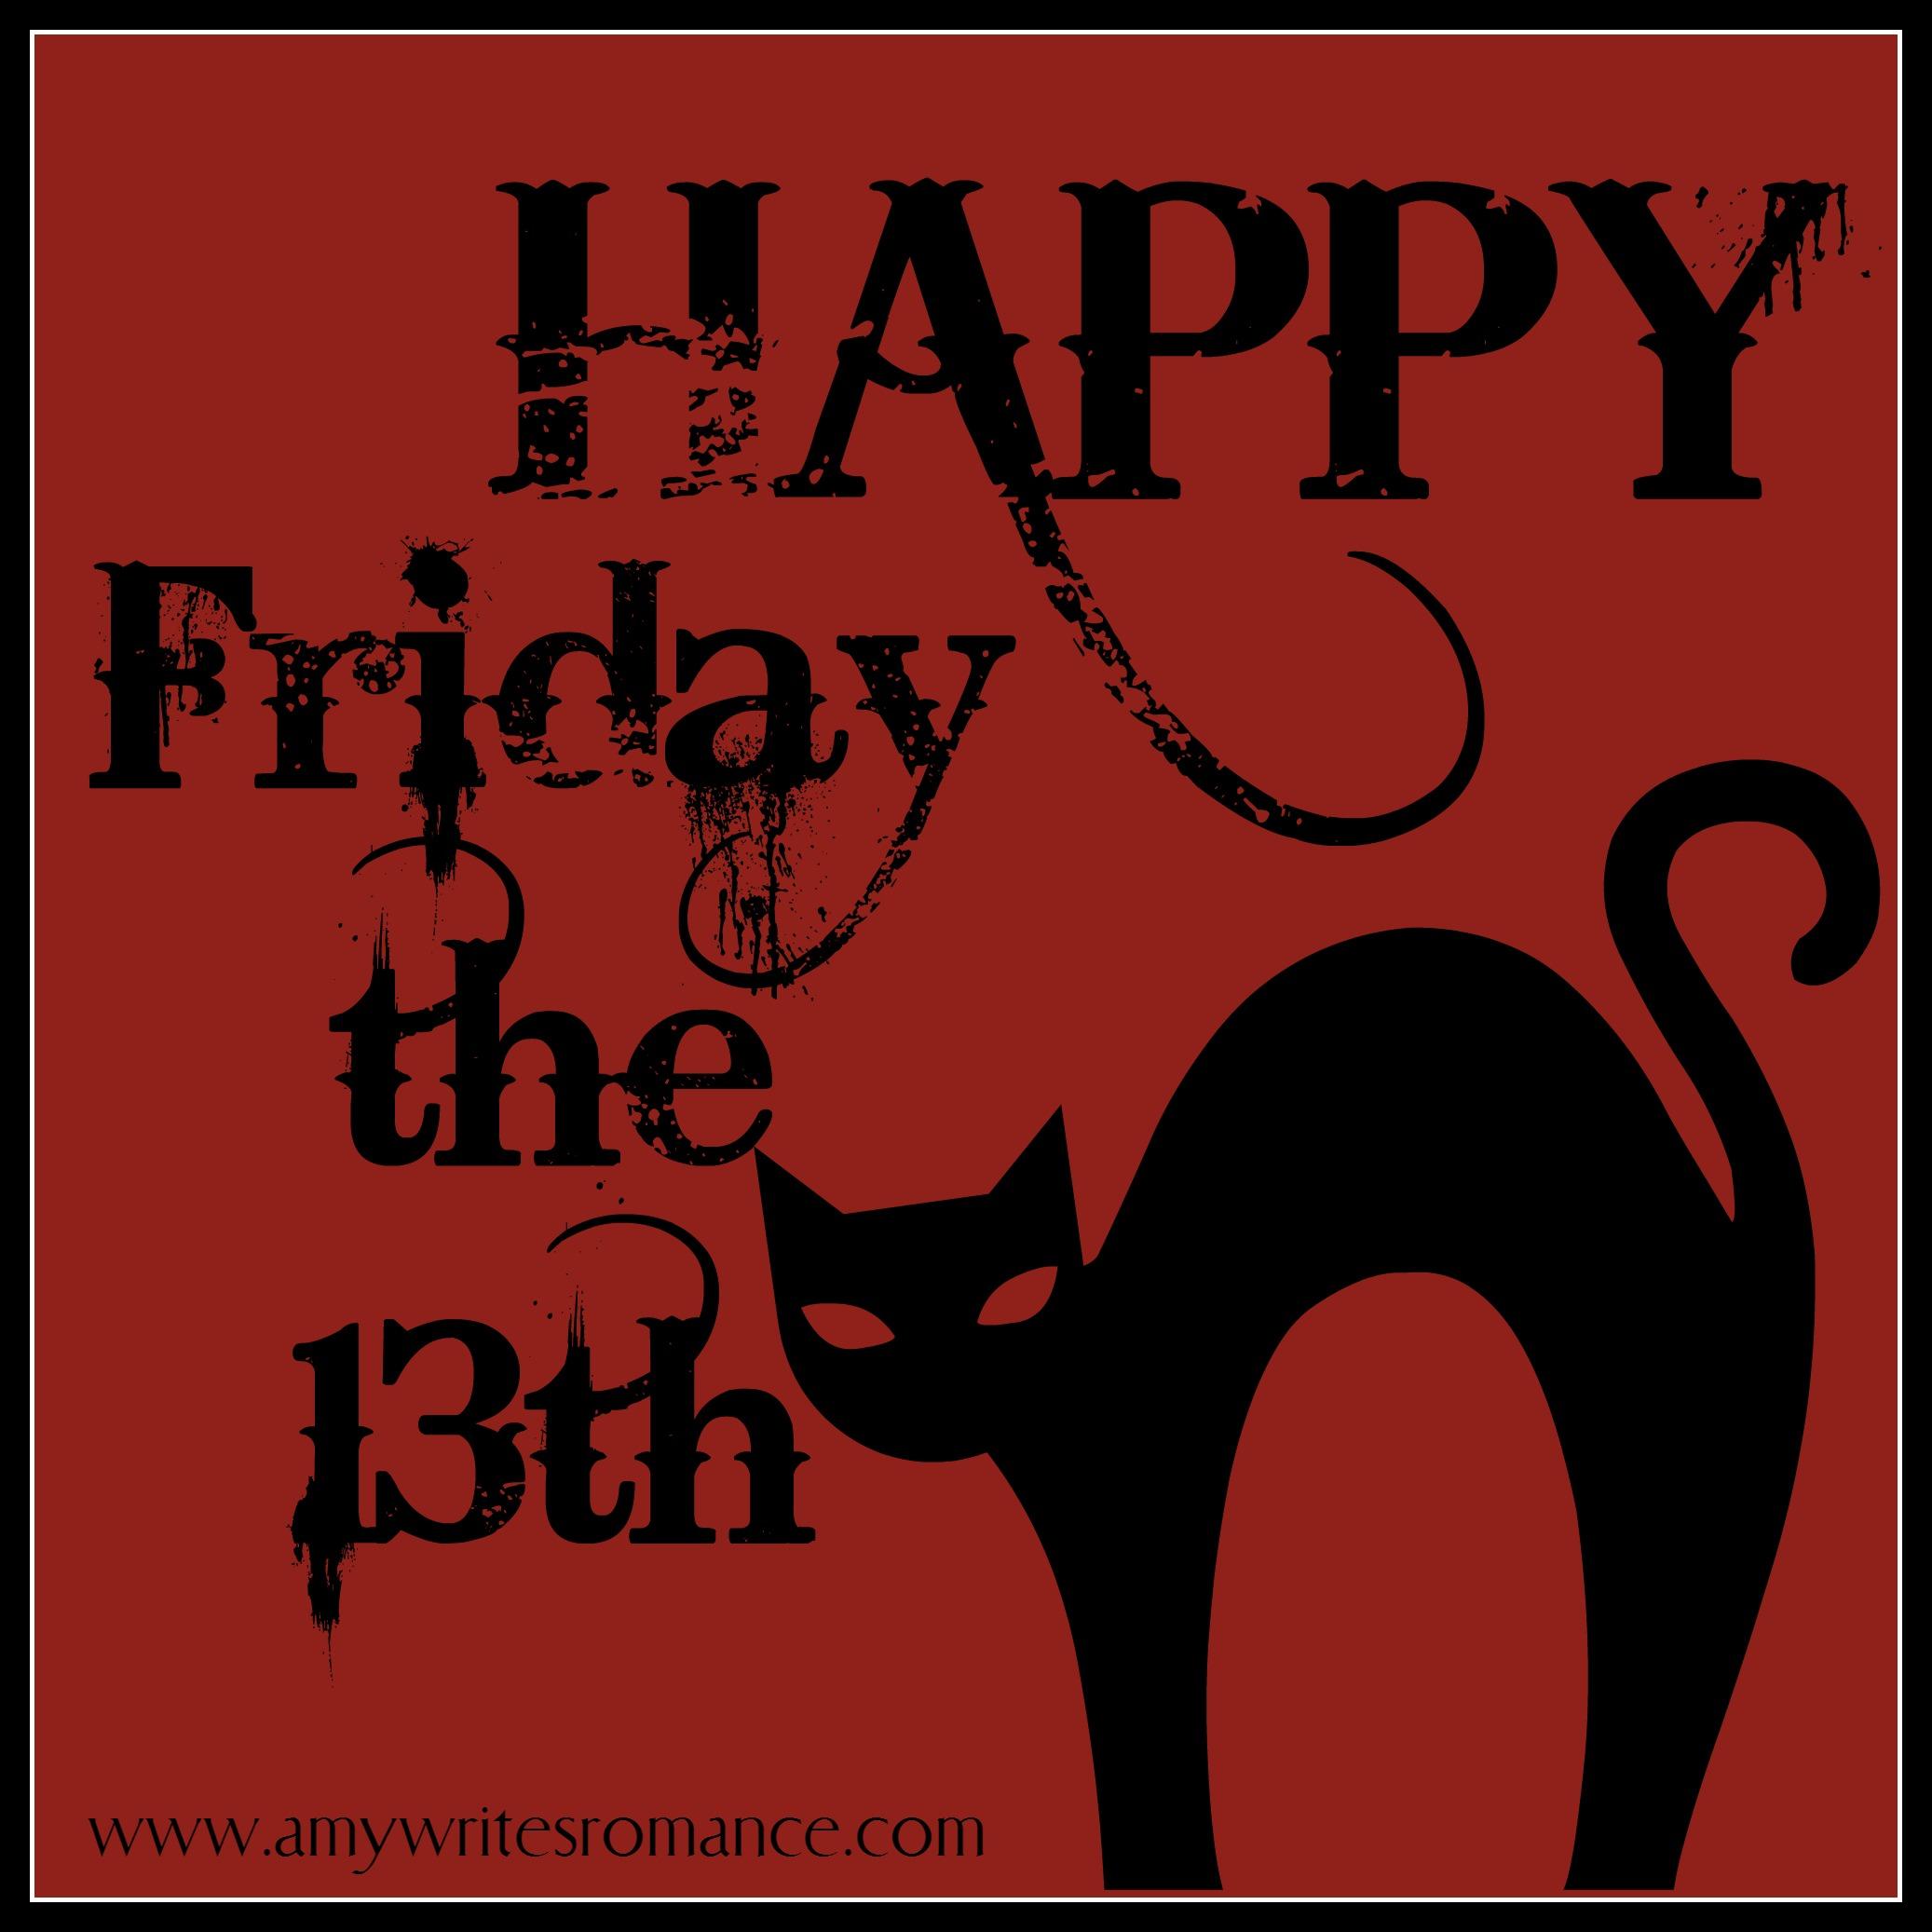 Happy Friday The 13th Amy Lillard Romance